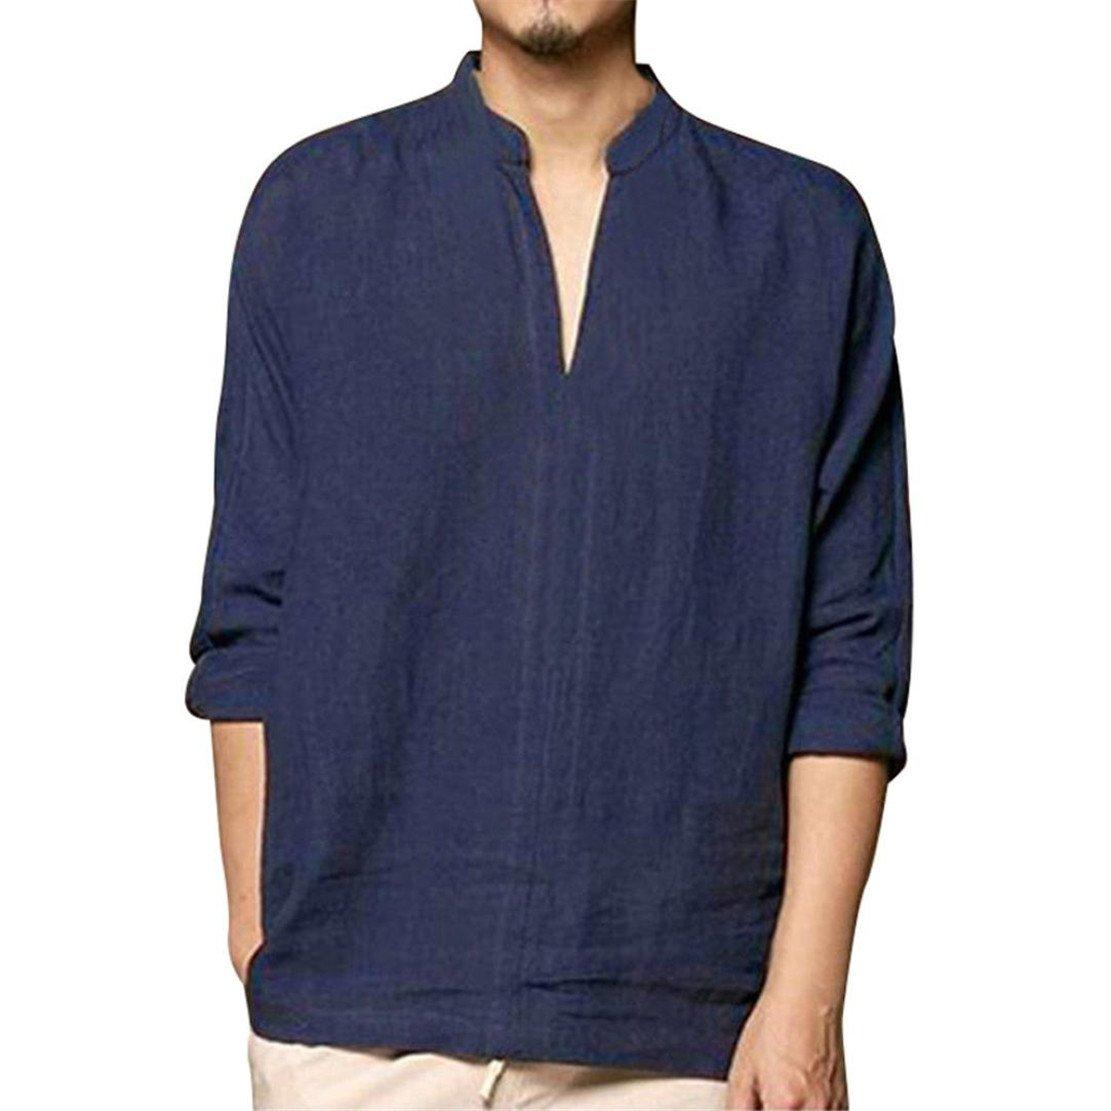 Bluestercool T-Shirt Uomo Manica Lunga Polo Moda Magliette Tinta Unita